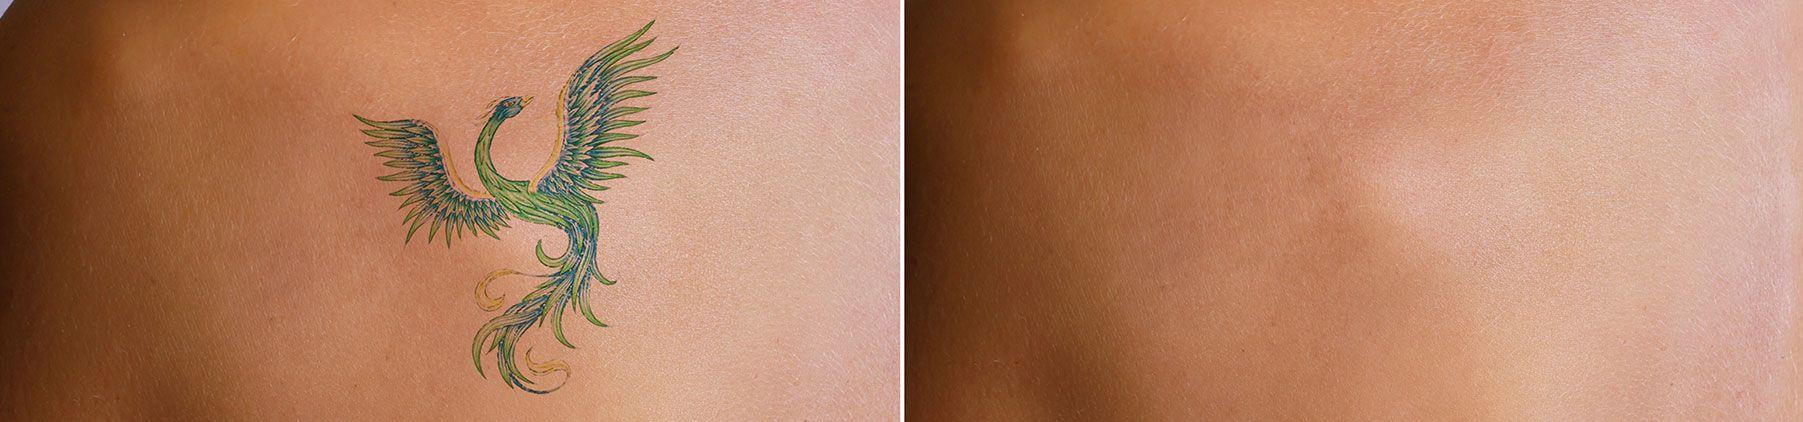 New Orleans Skin Doctor - Rose Dermatology - Laser Tattoo Removal |